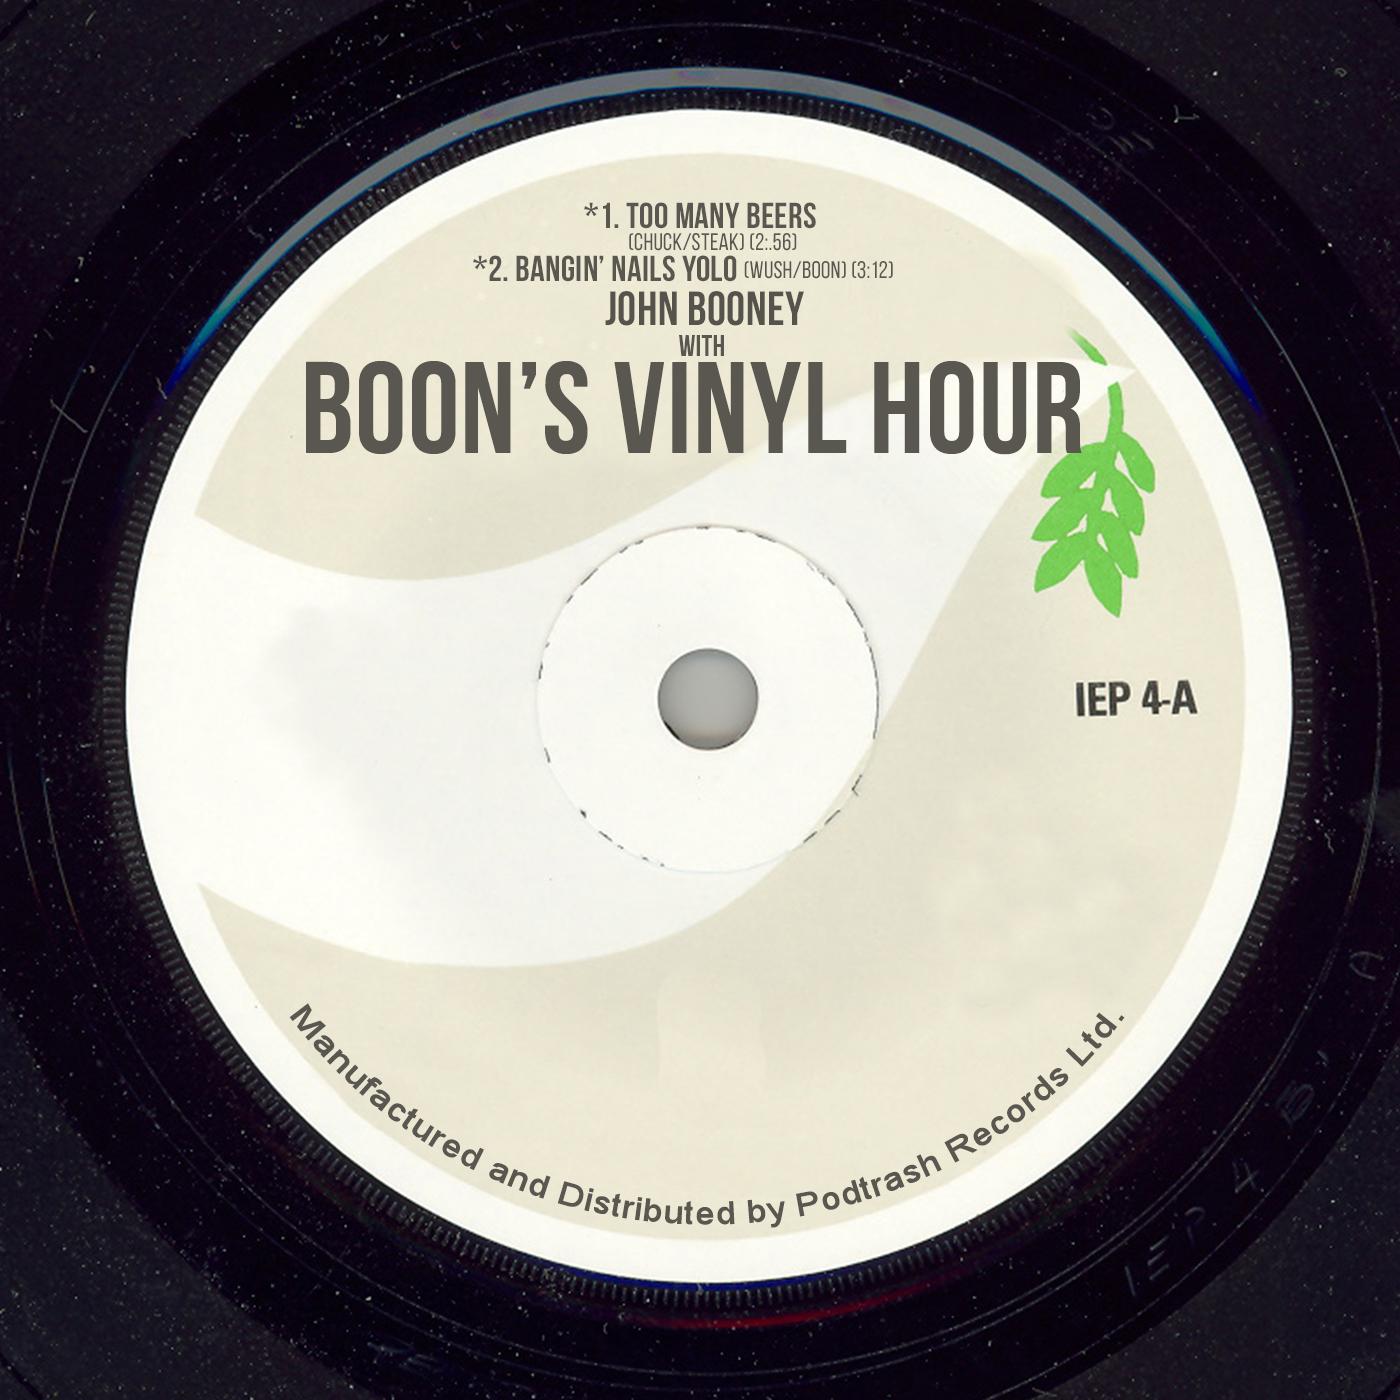 Boon's Vinyl Hour